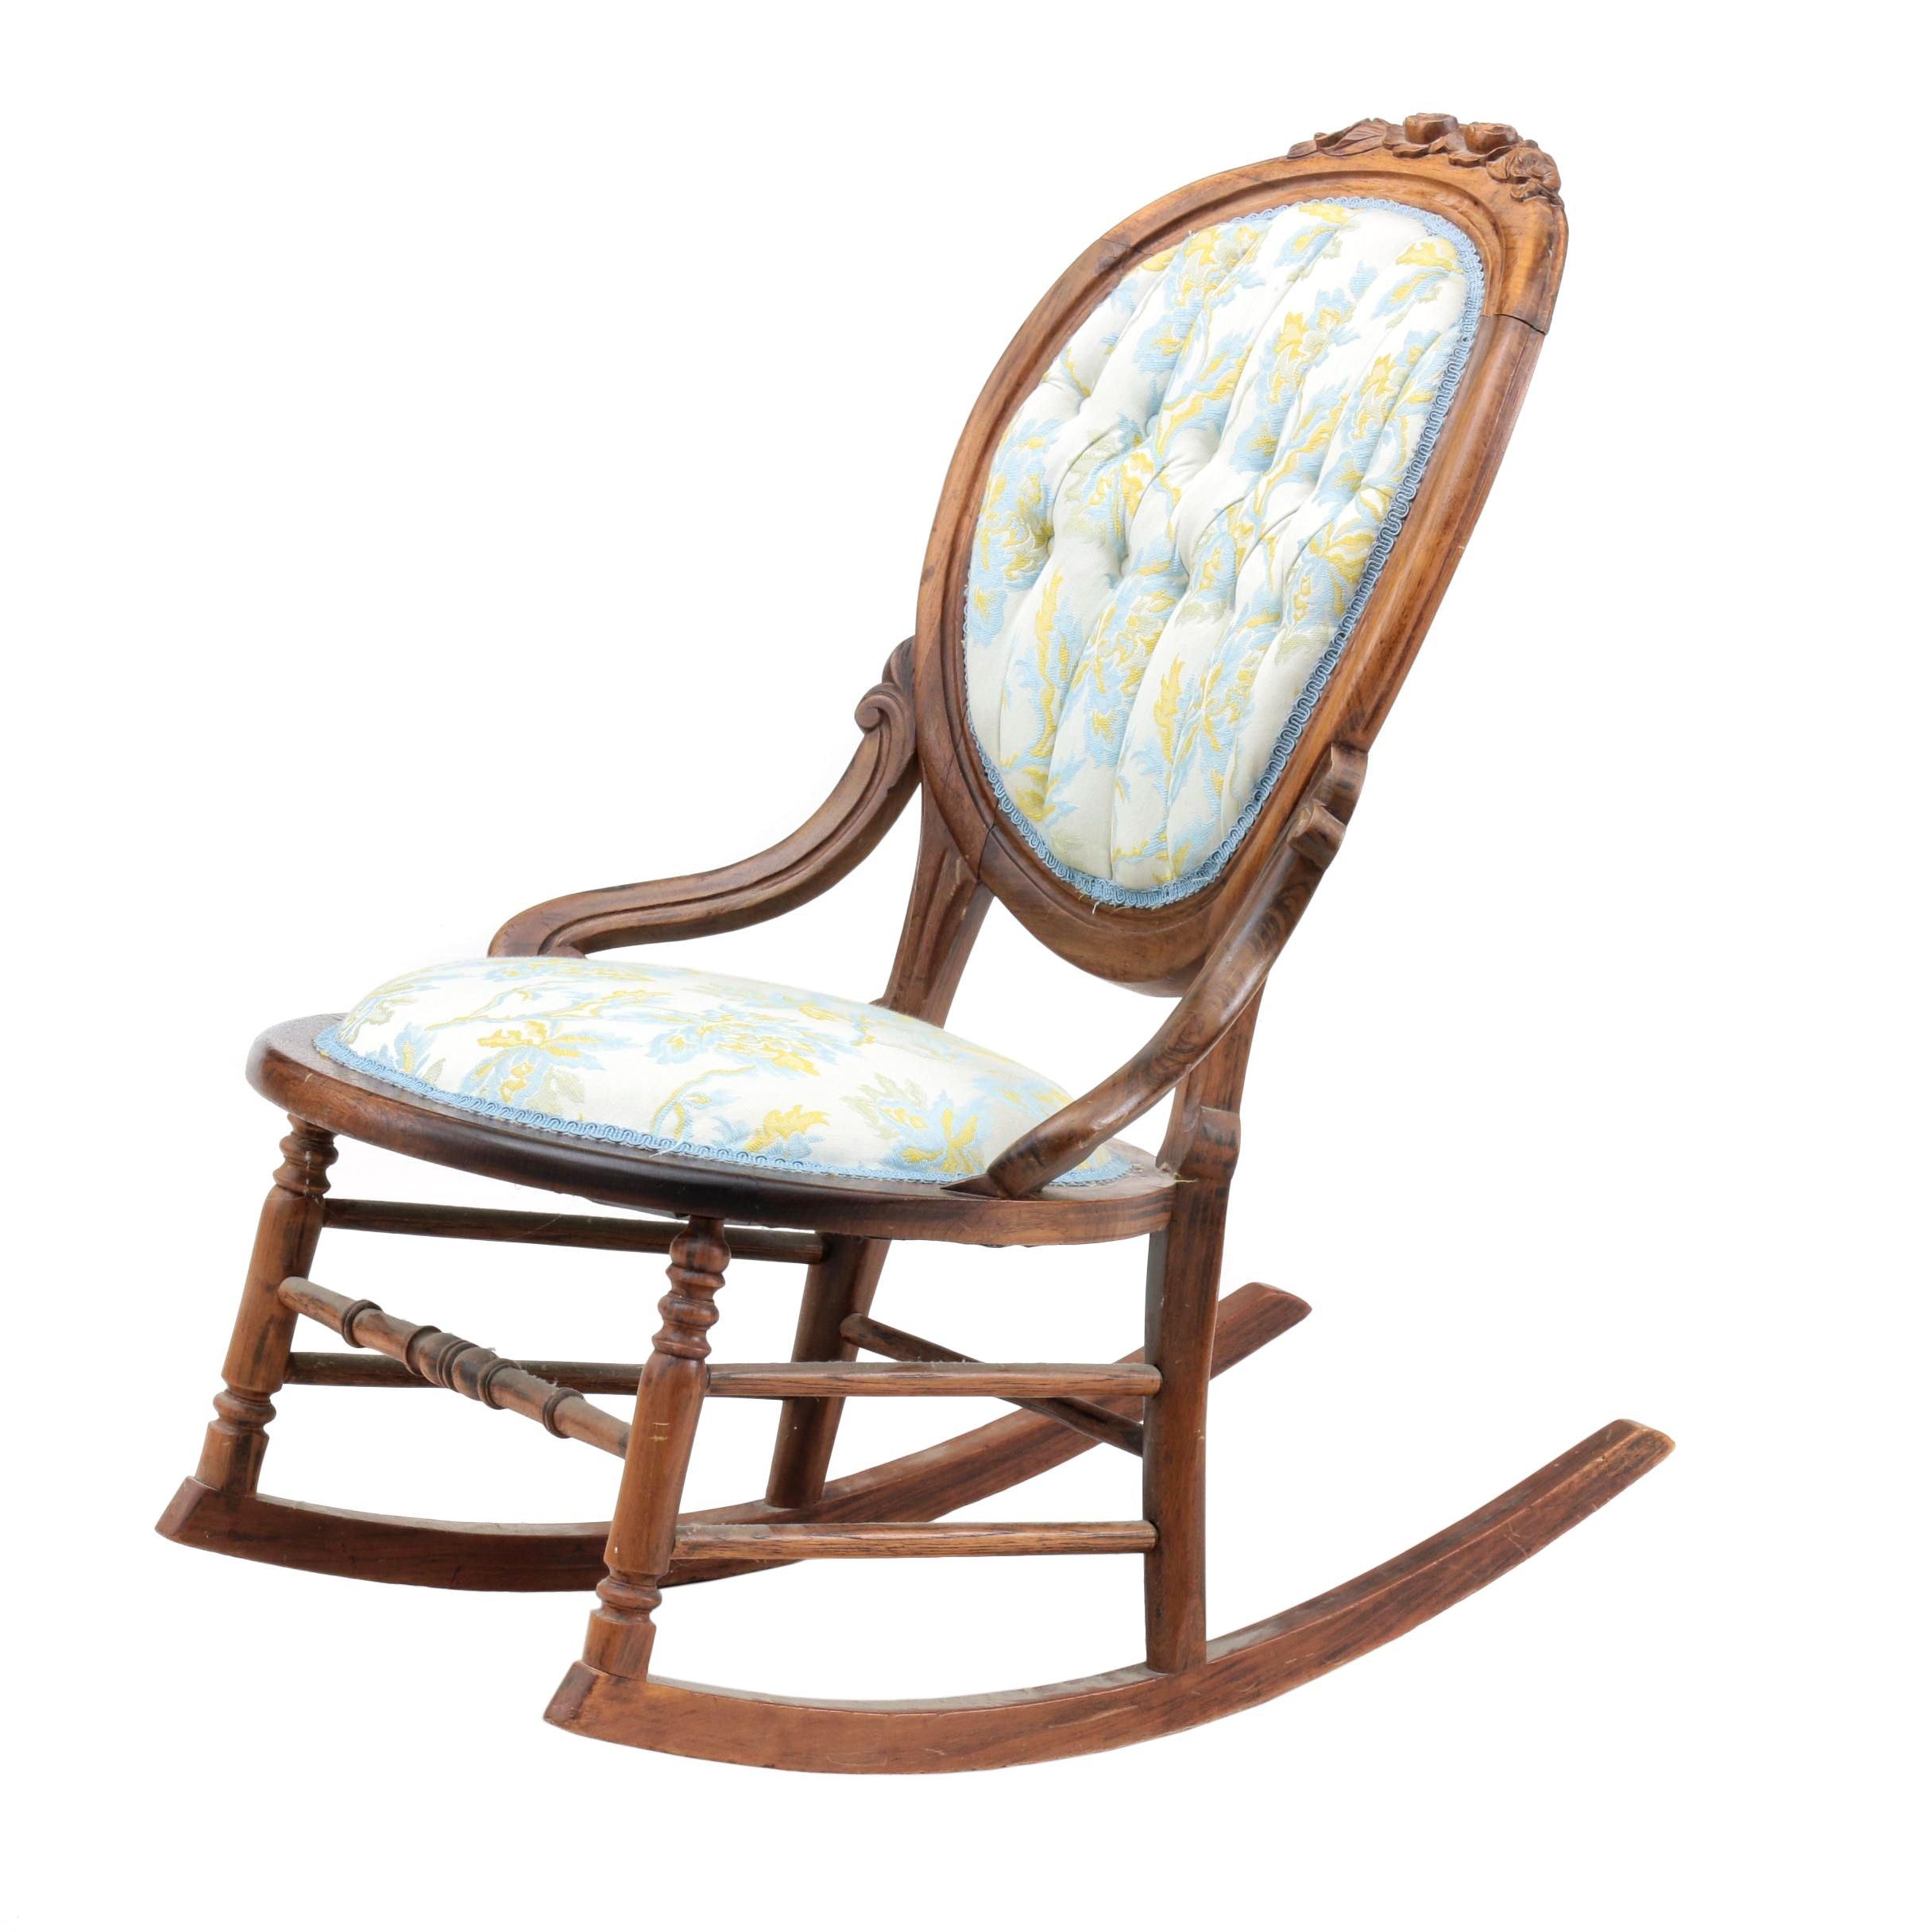 Victorian Style Rocking Chair in Walnut